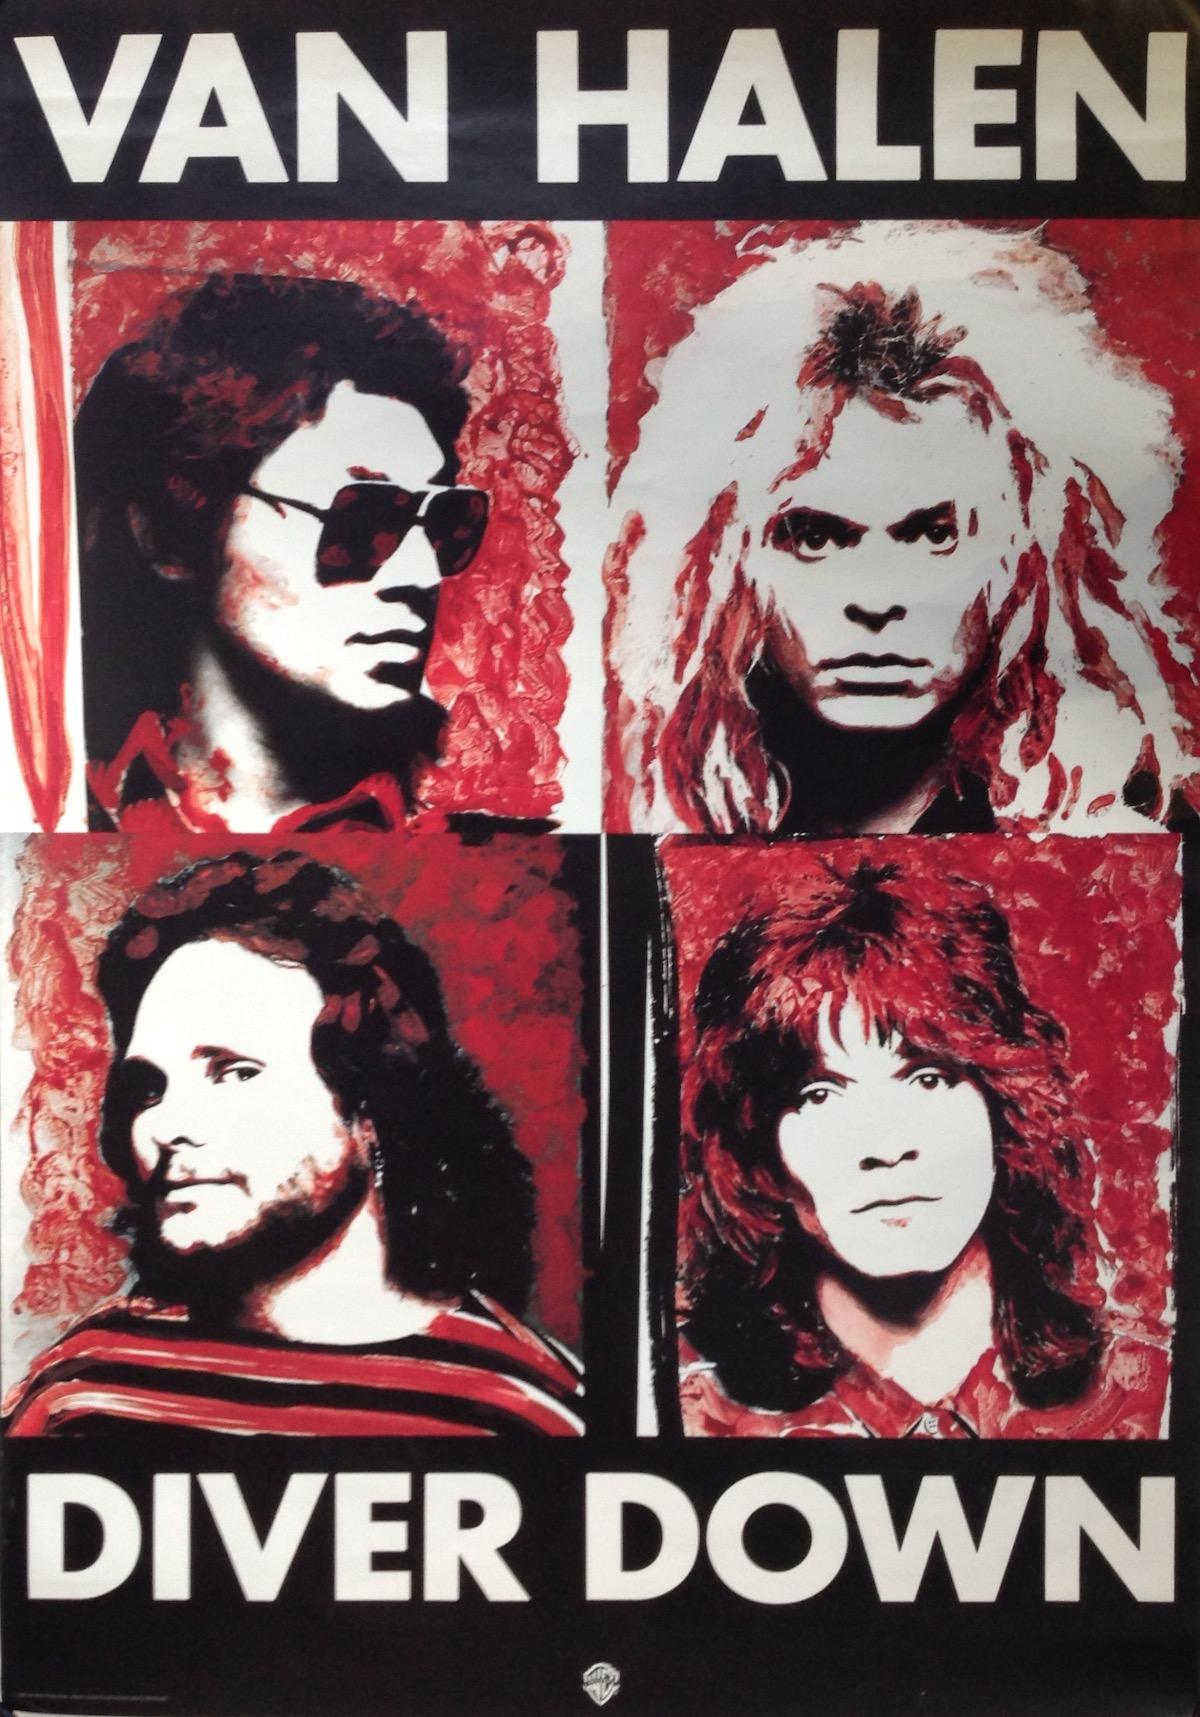 Van Halen Diver Down 1982 Promo Poster Tinnitist